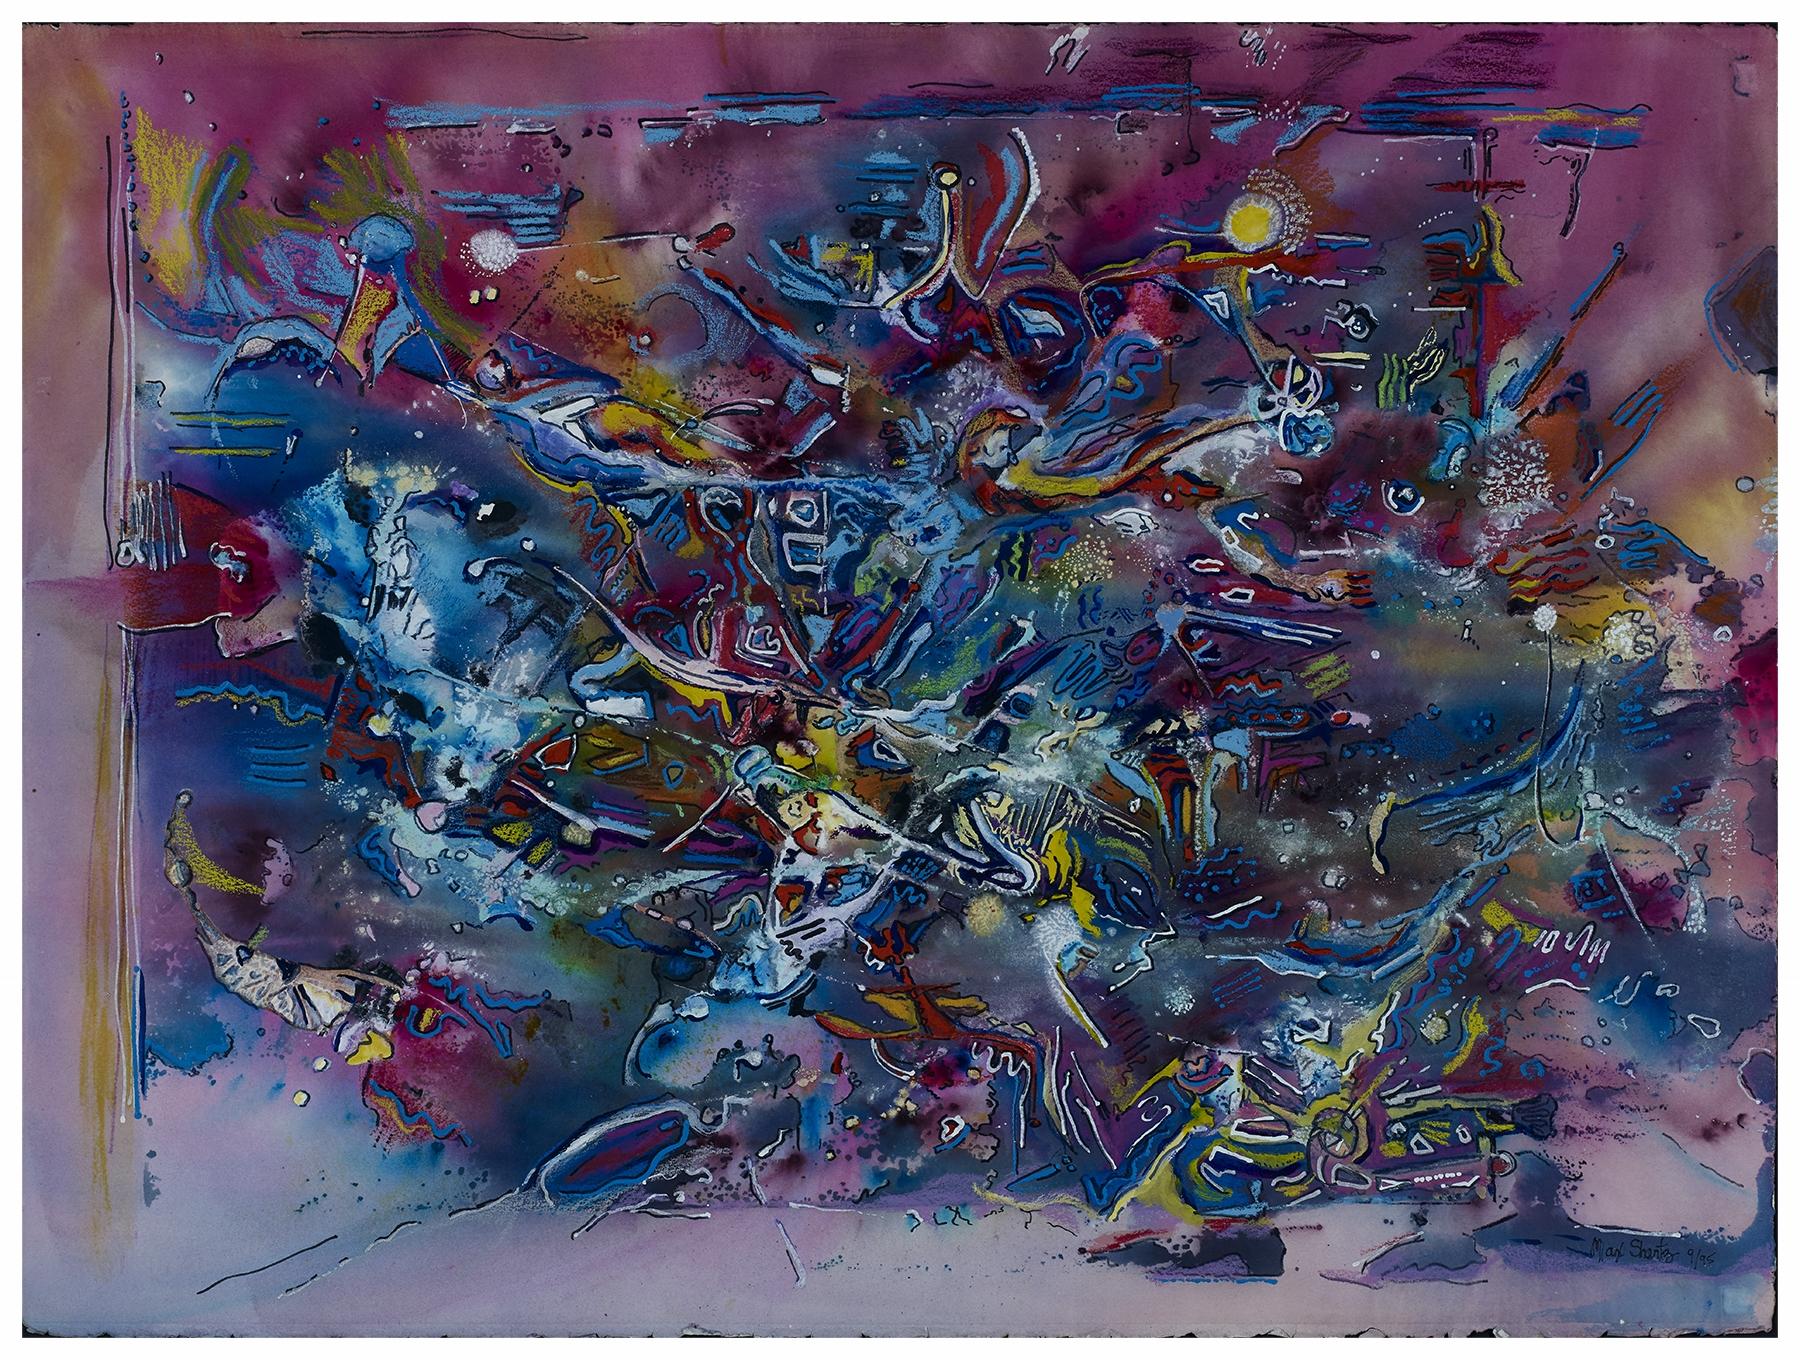 Iridescence 1995 23x30 Mixed Medium